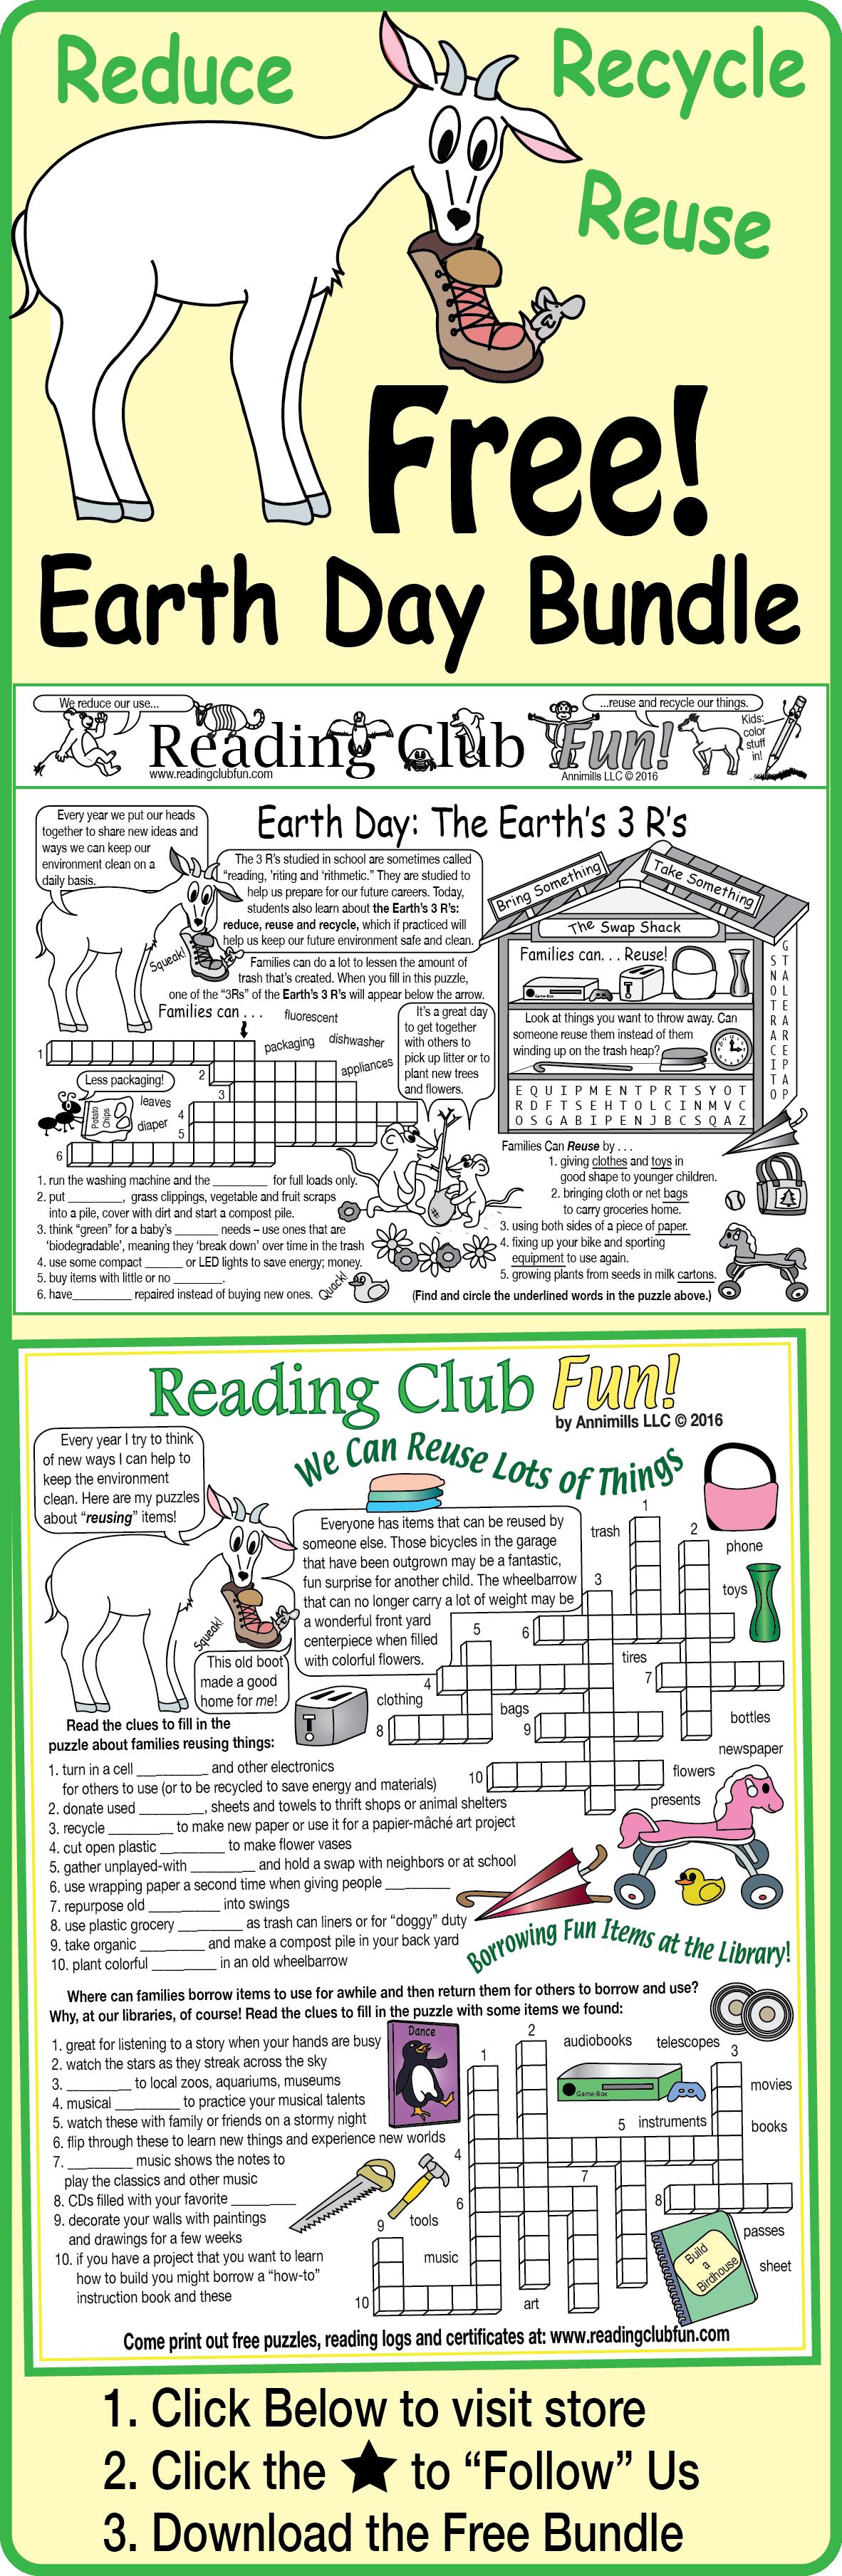 S Teacherspayteachers Store Reading Club Fun